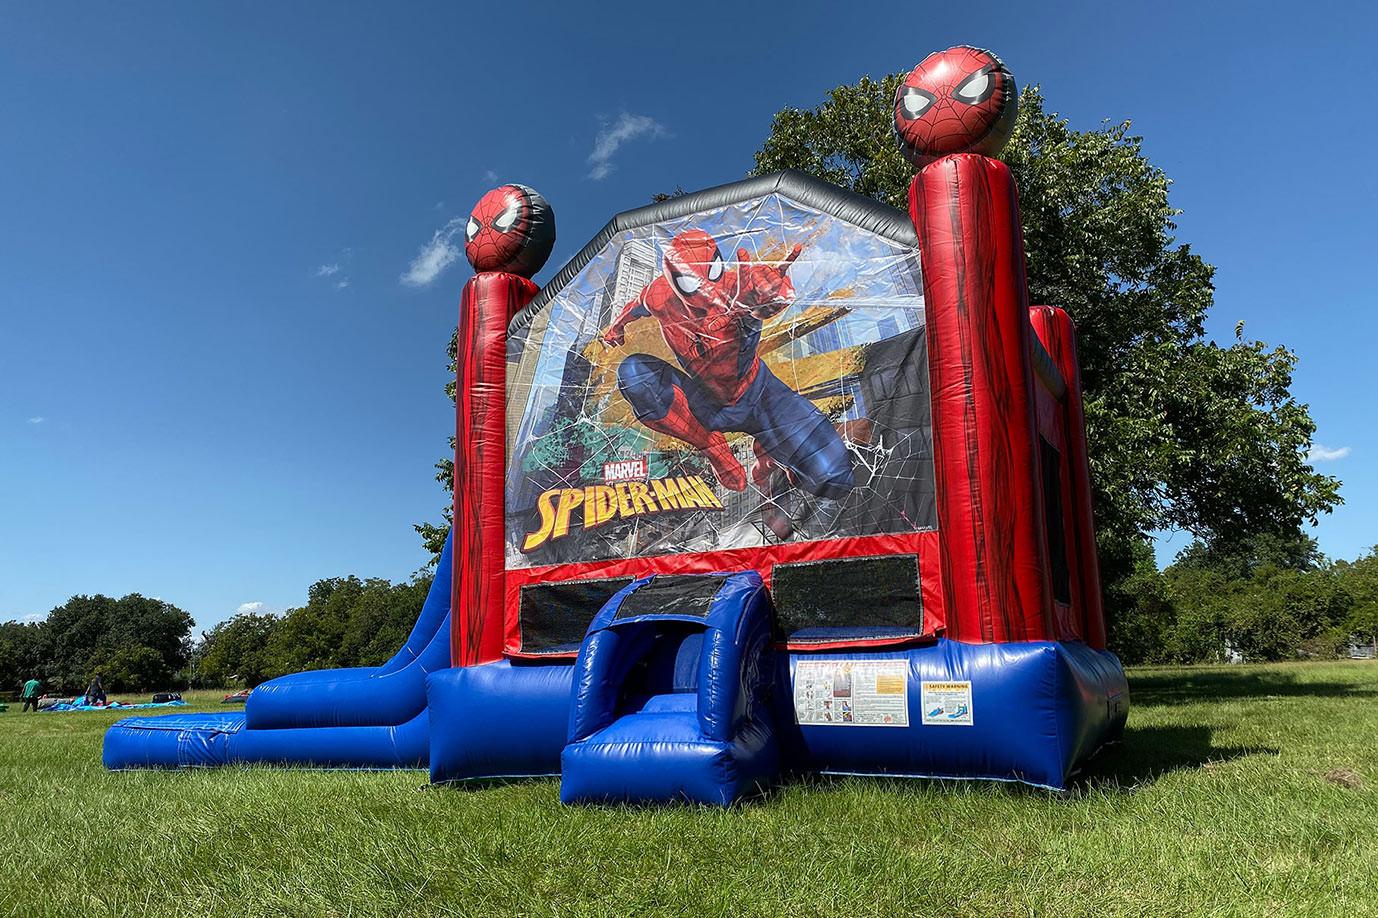 Spider-Man Bounce House Slide